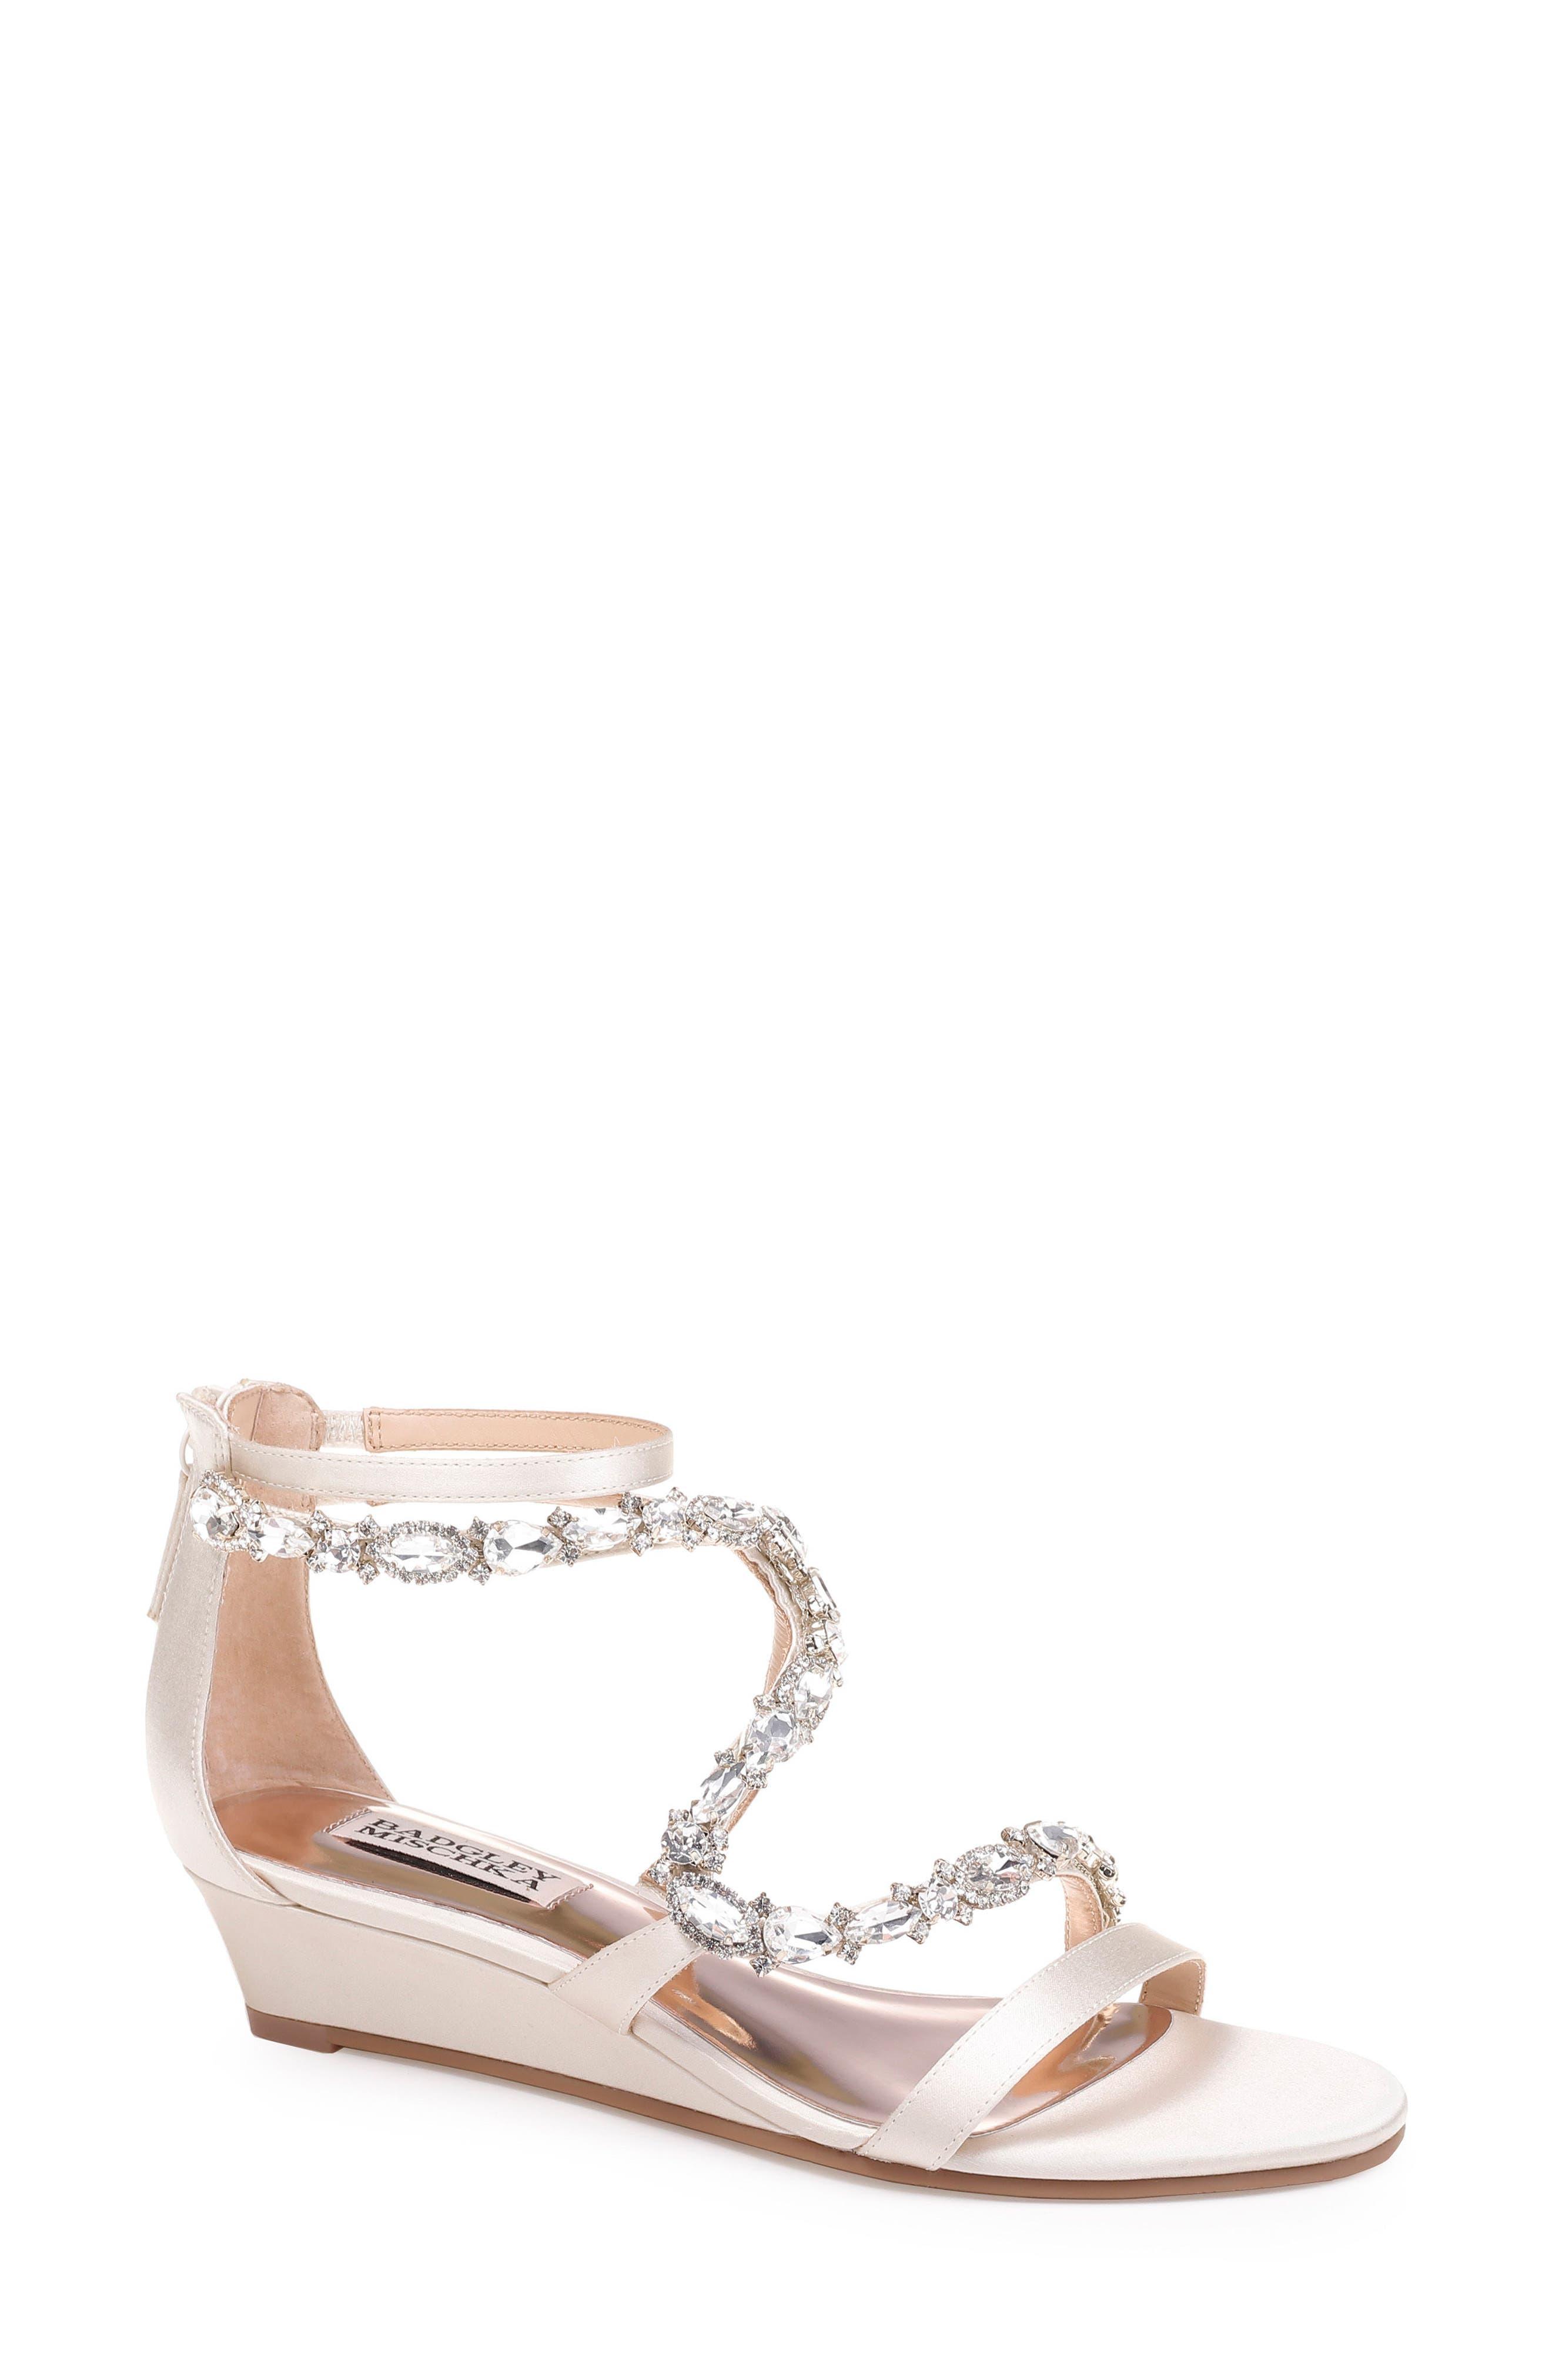 Badgley Mischka Sierra Strappy Wedge Sandal- White